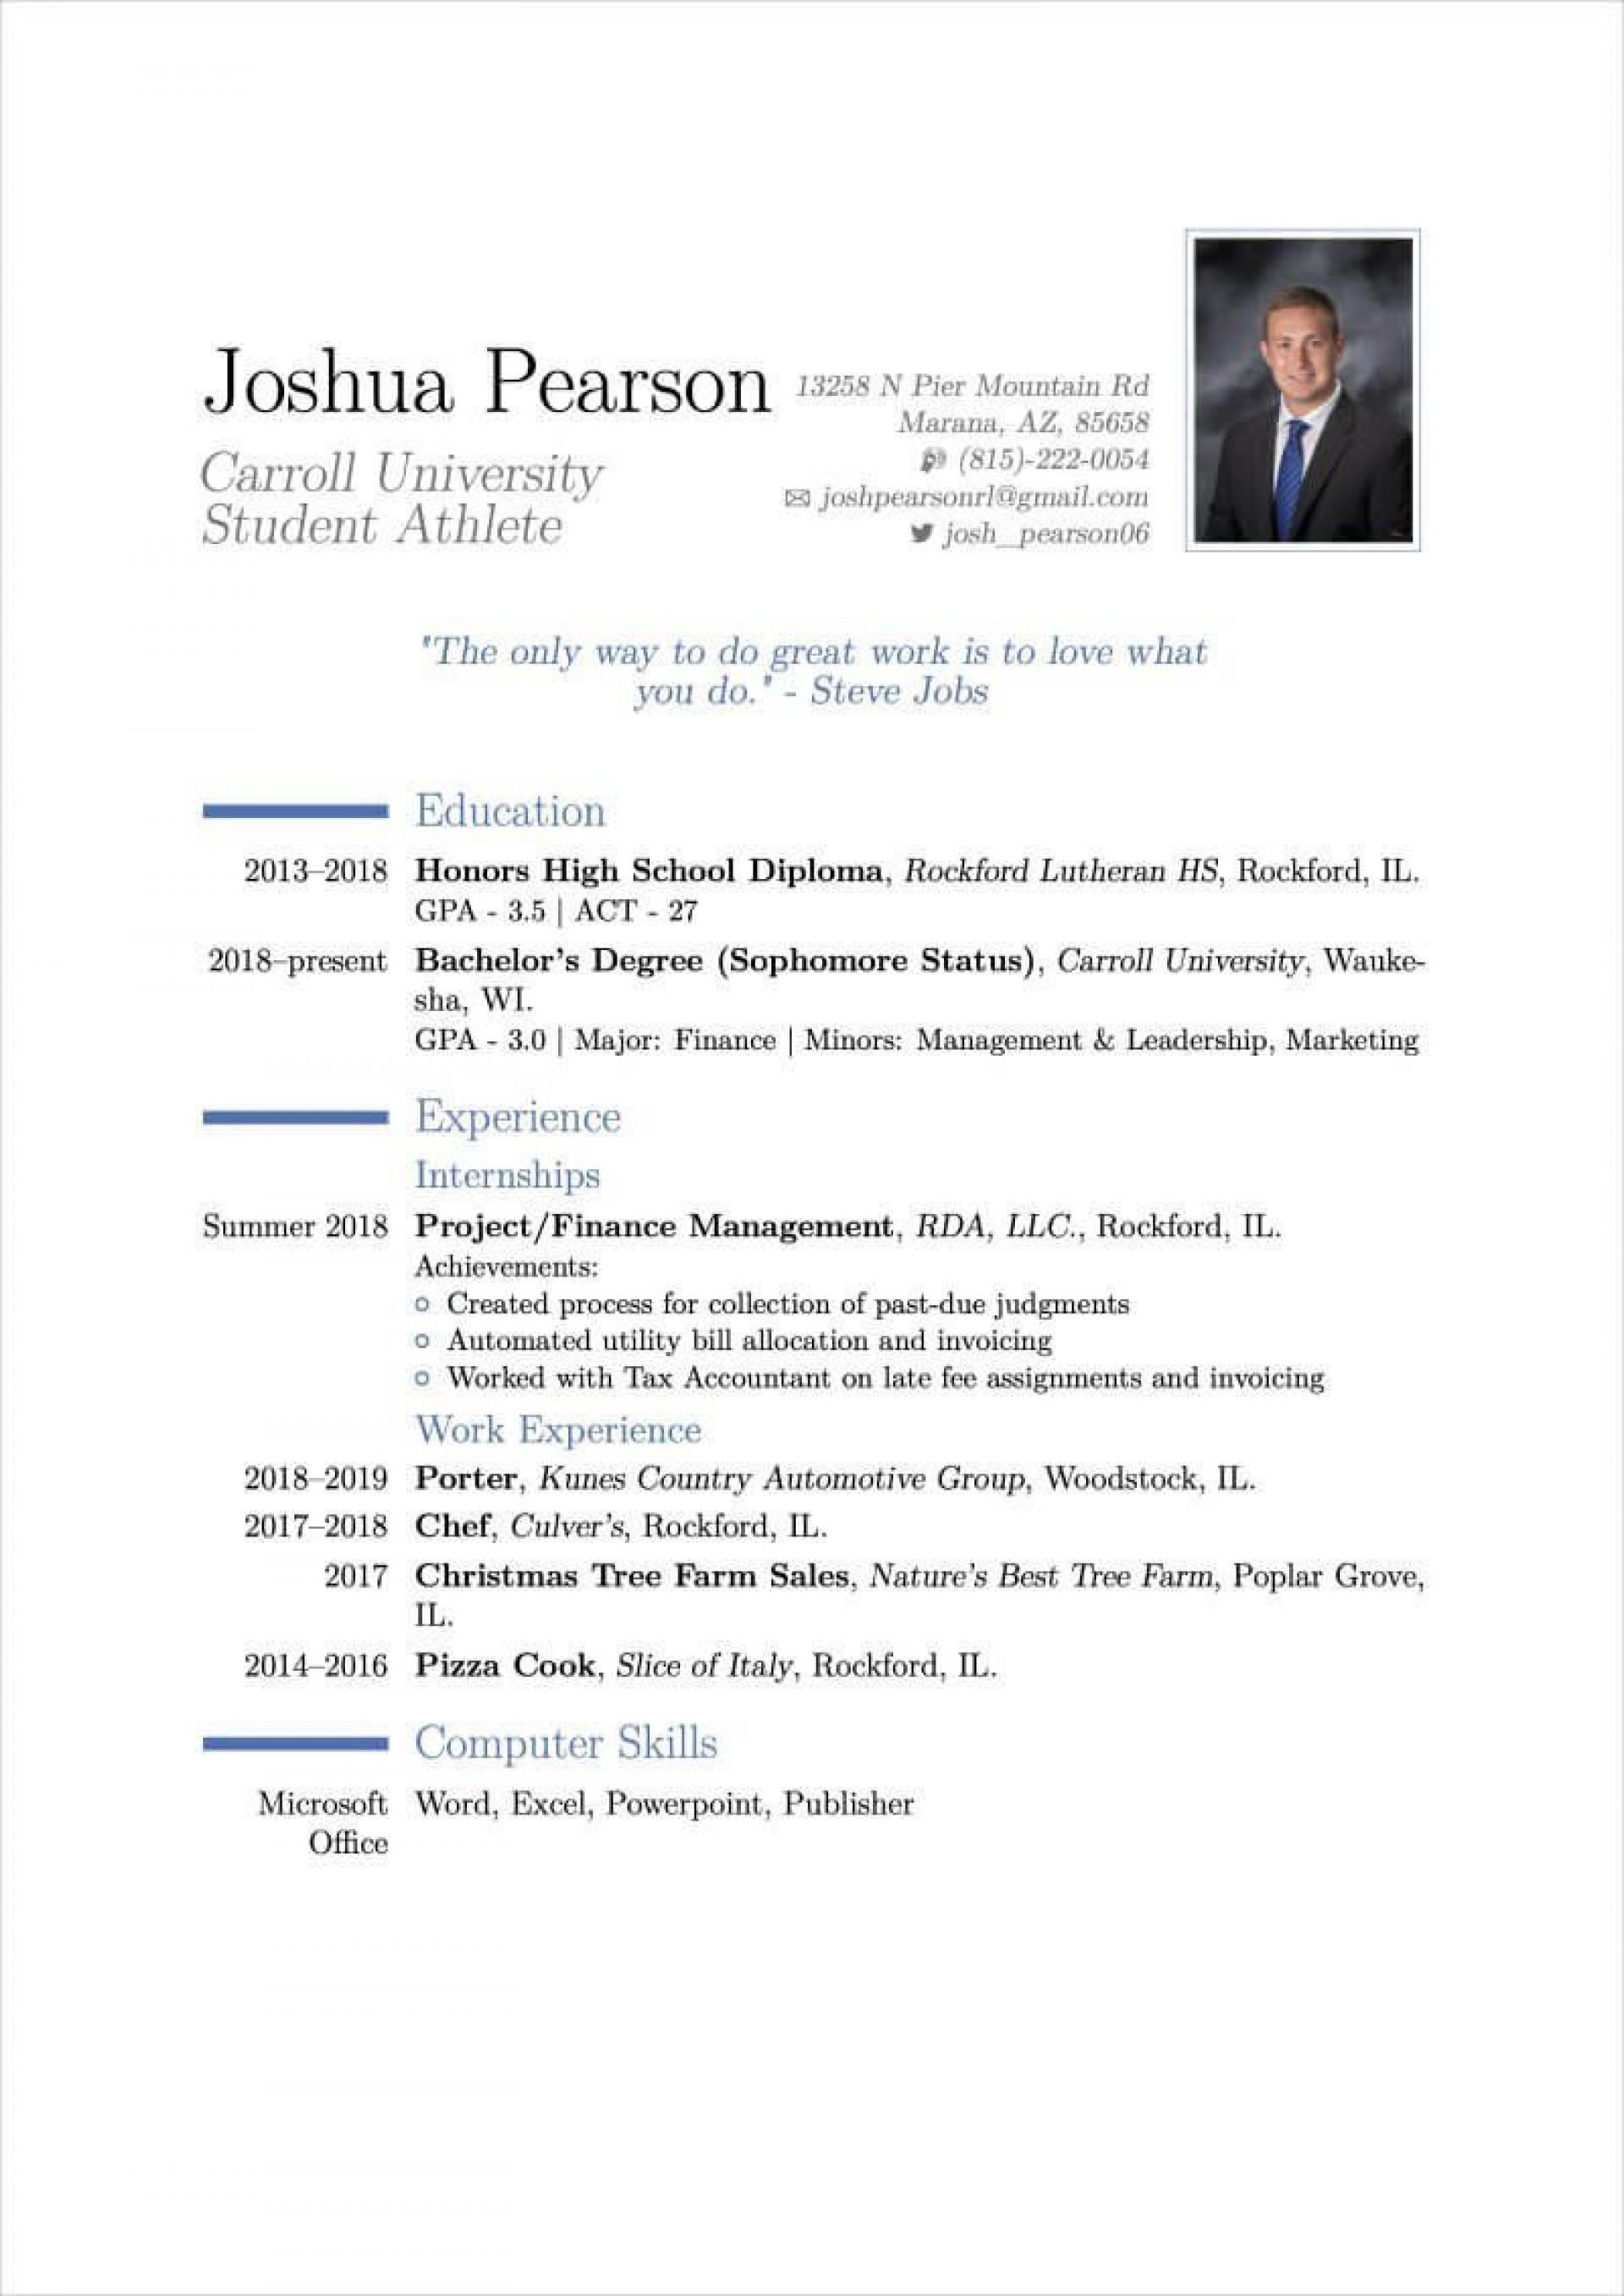 009 Shocking Latex Academic Cv Template Photo  Publication Overleaf Economic1920